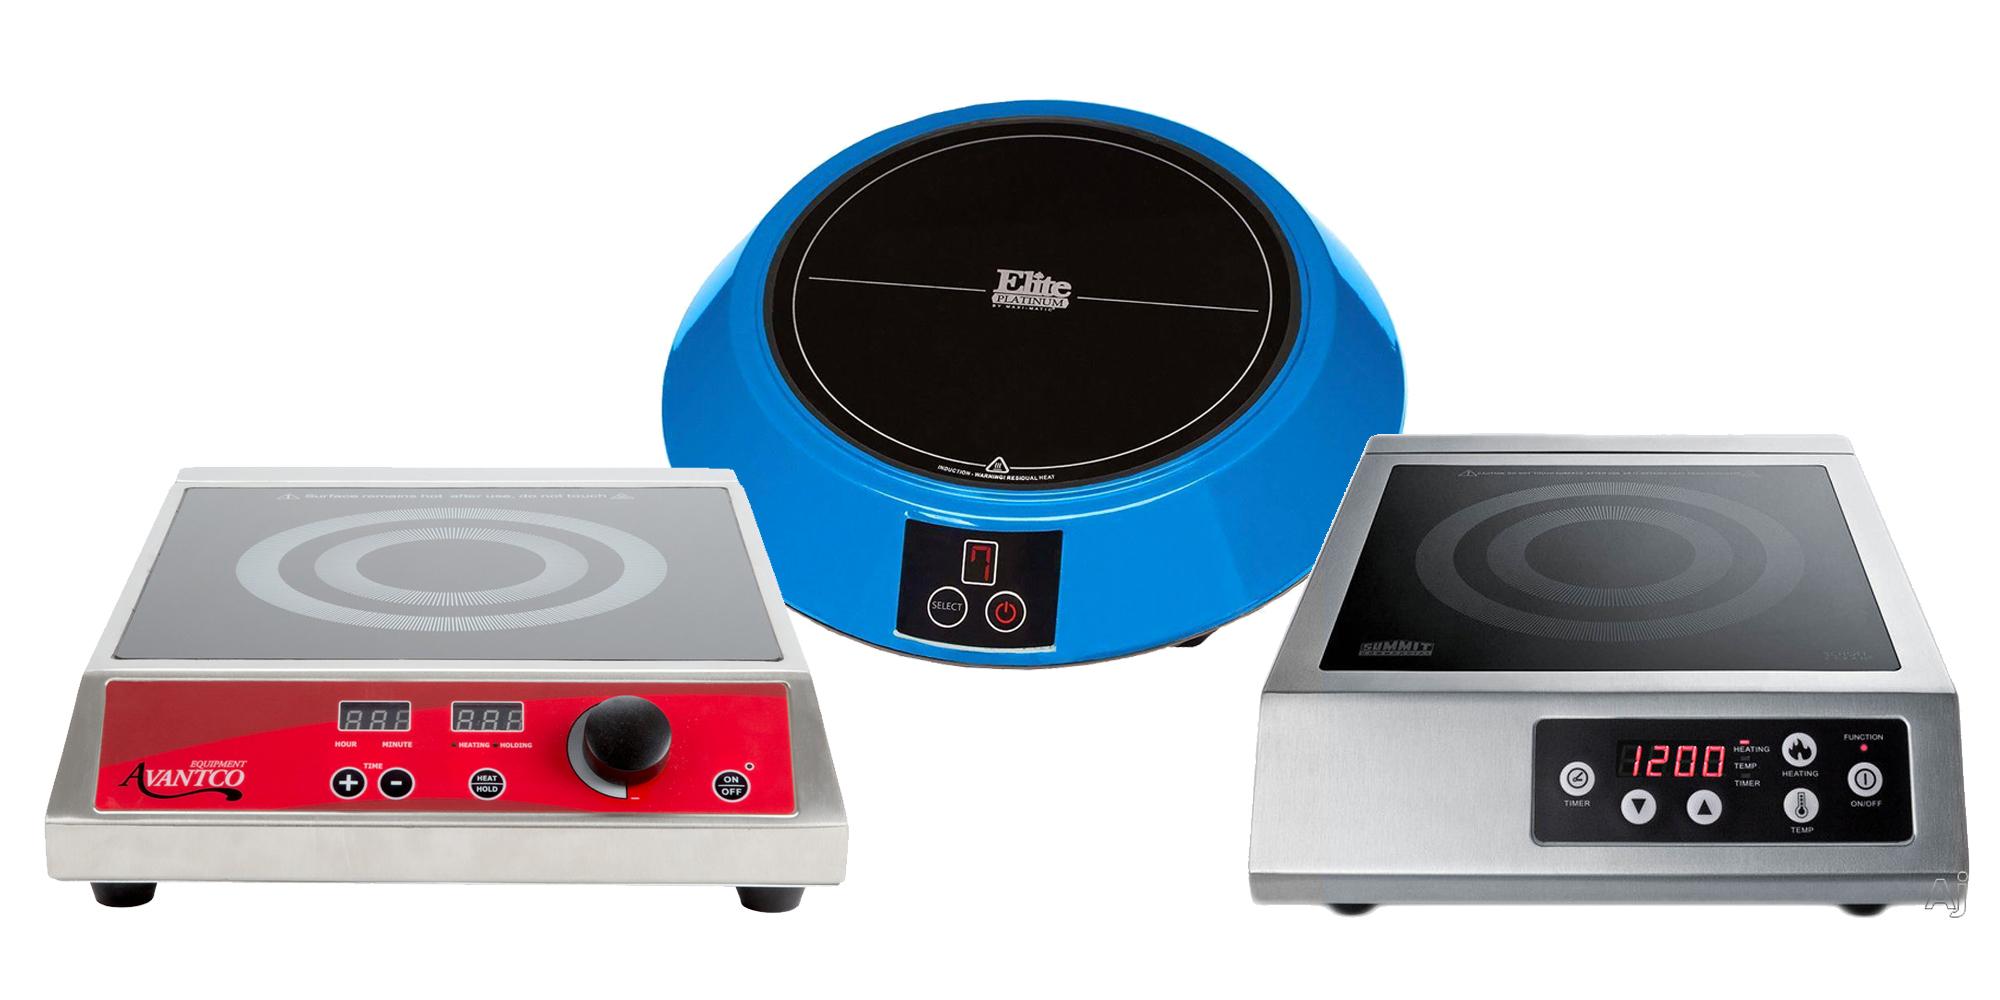 11 best induction cooktops cookers 2017 portable single burner induction cooktops. Black Bedroom Furniture Sets. Home Design Ideas